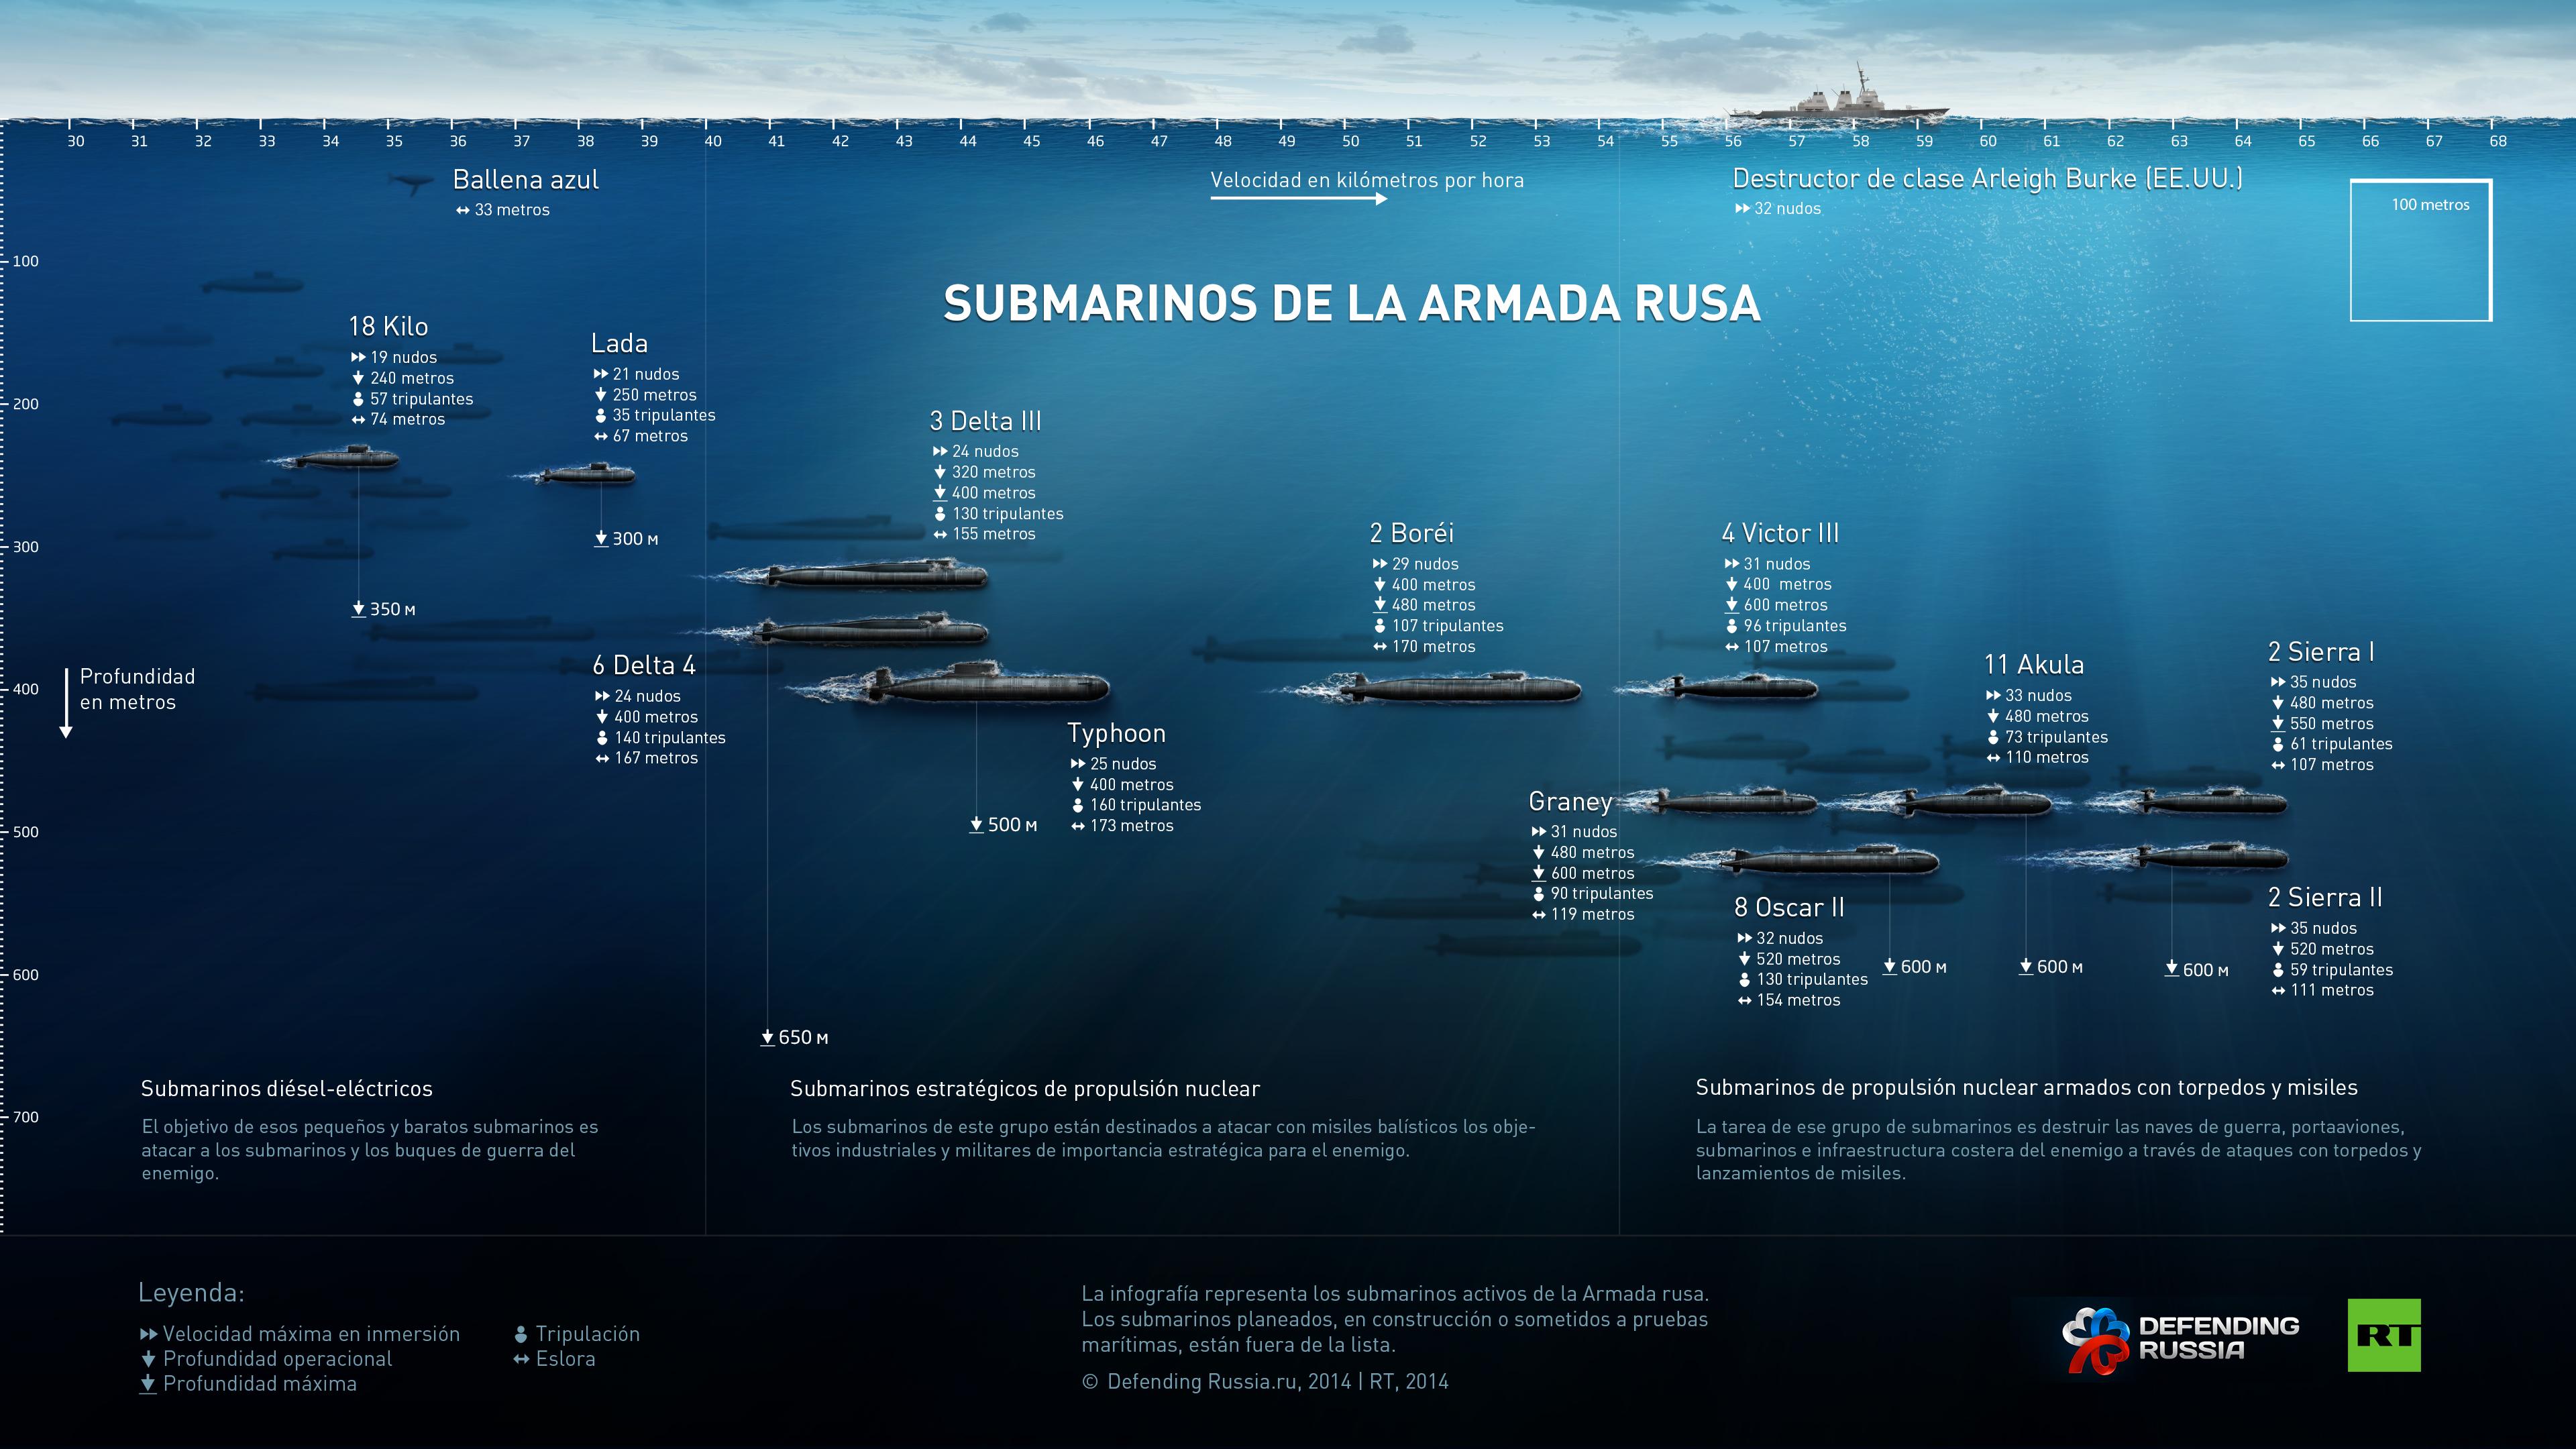 submarinos rusos 4cb8b89e6a2cd30379982bcb7d776914